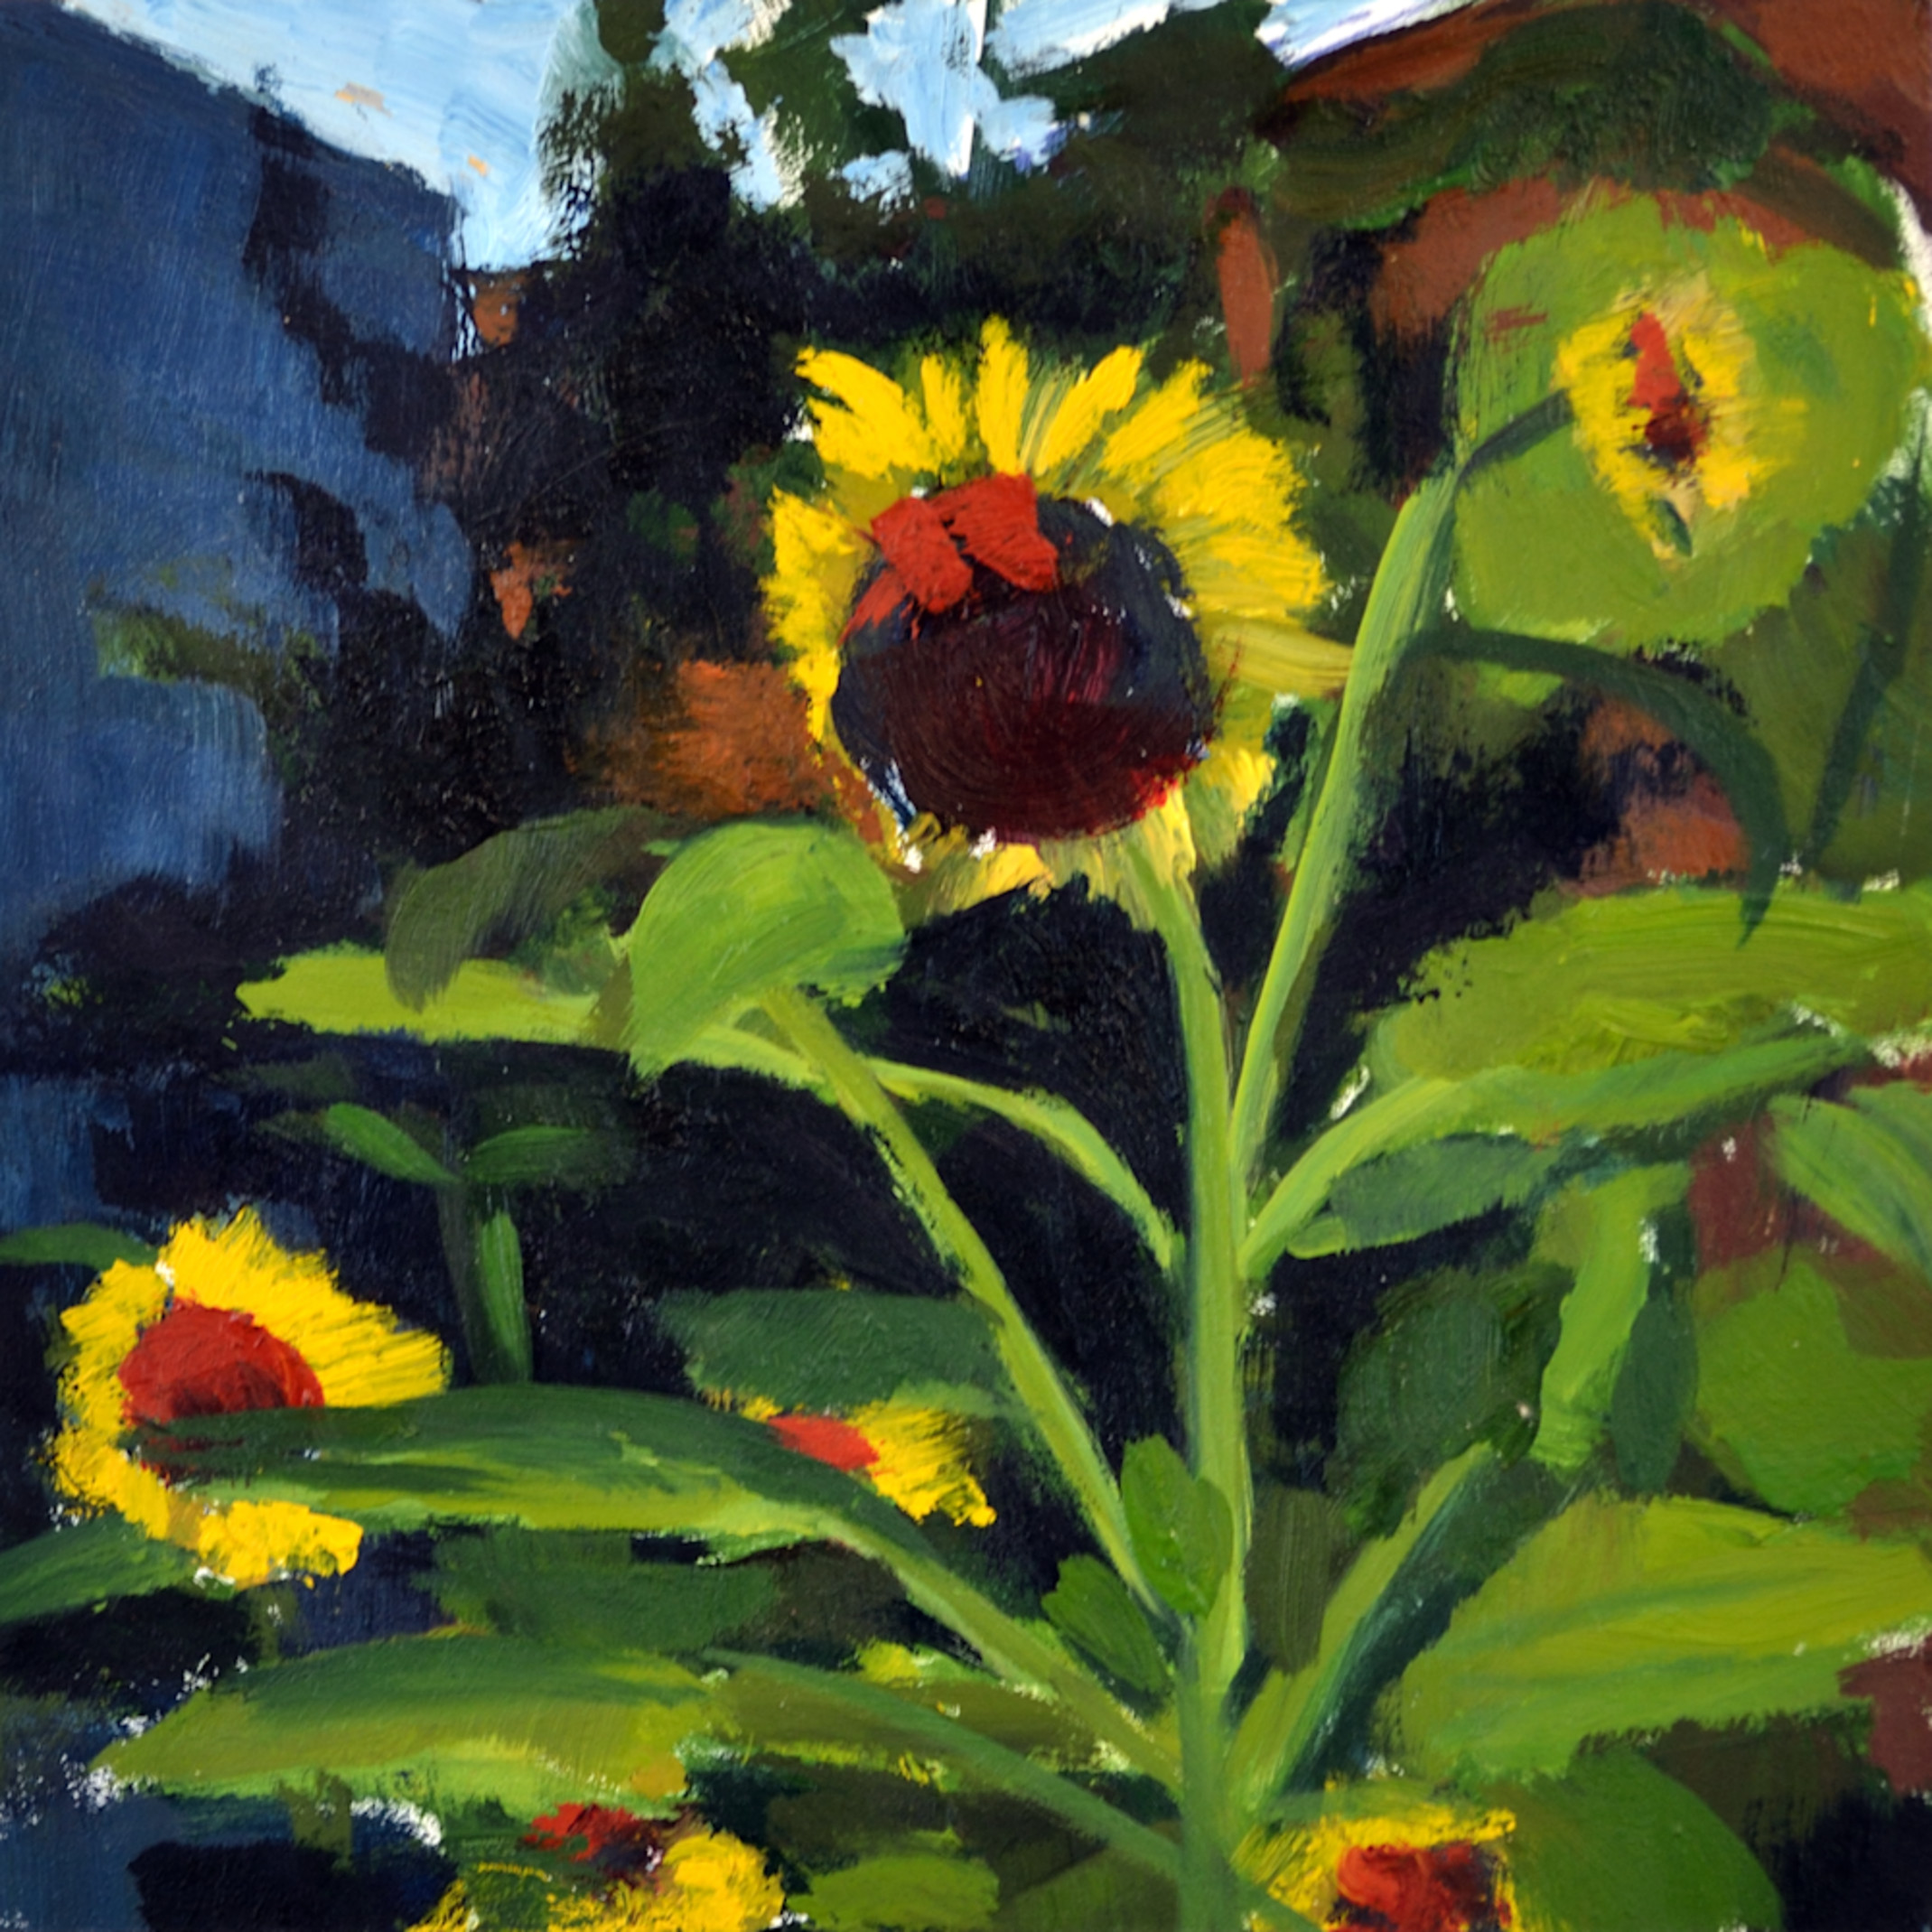 Hallgren minisunflowers 6x6 zwrxh4